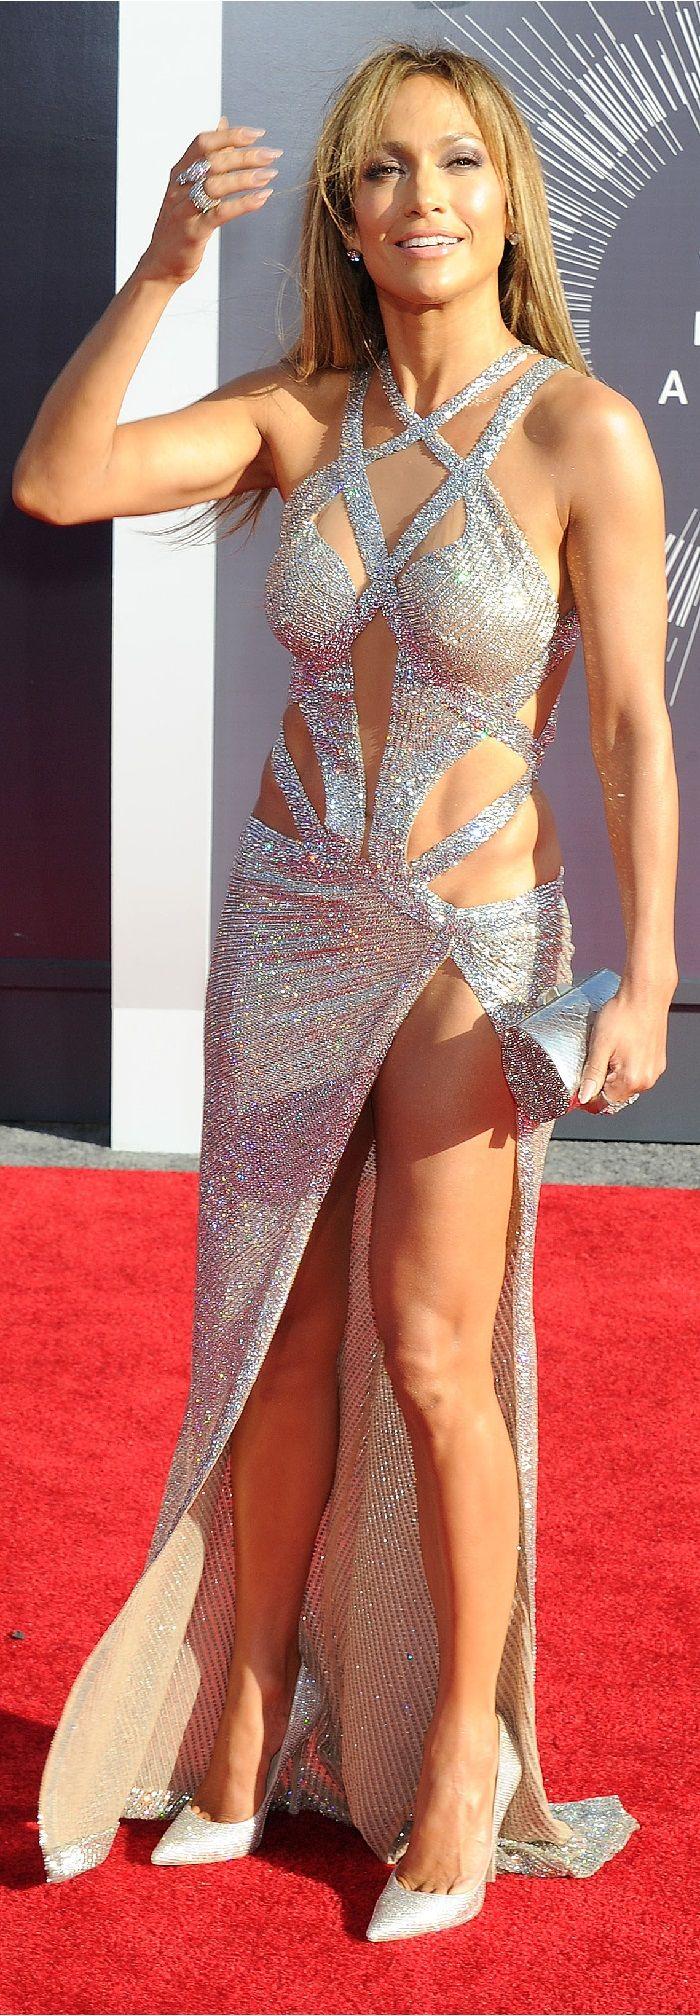 khloe kardashian id rather go nude